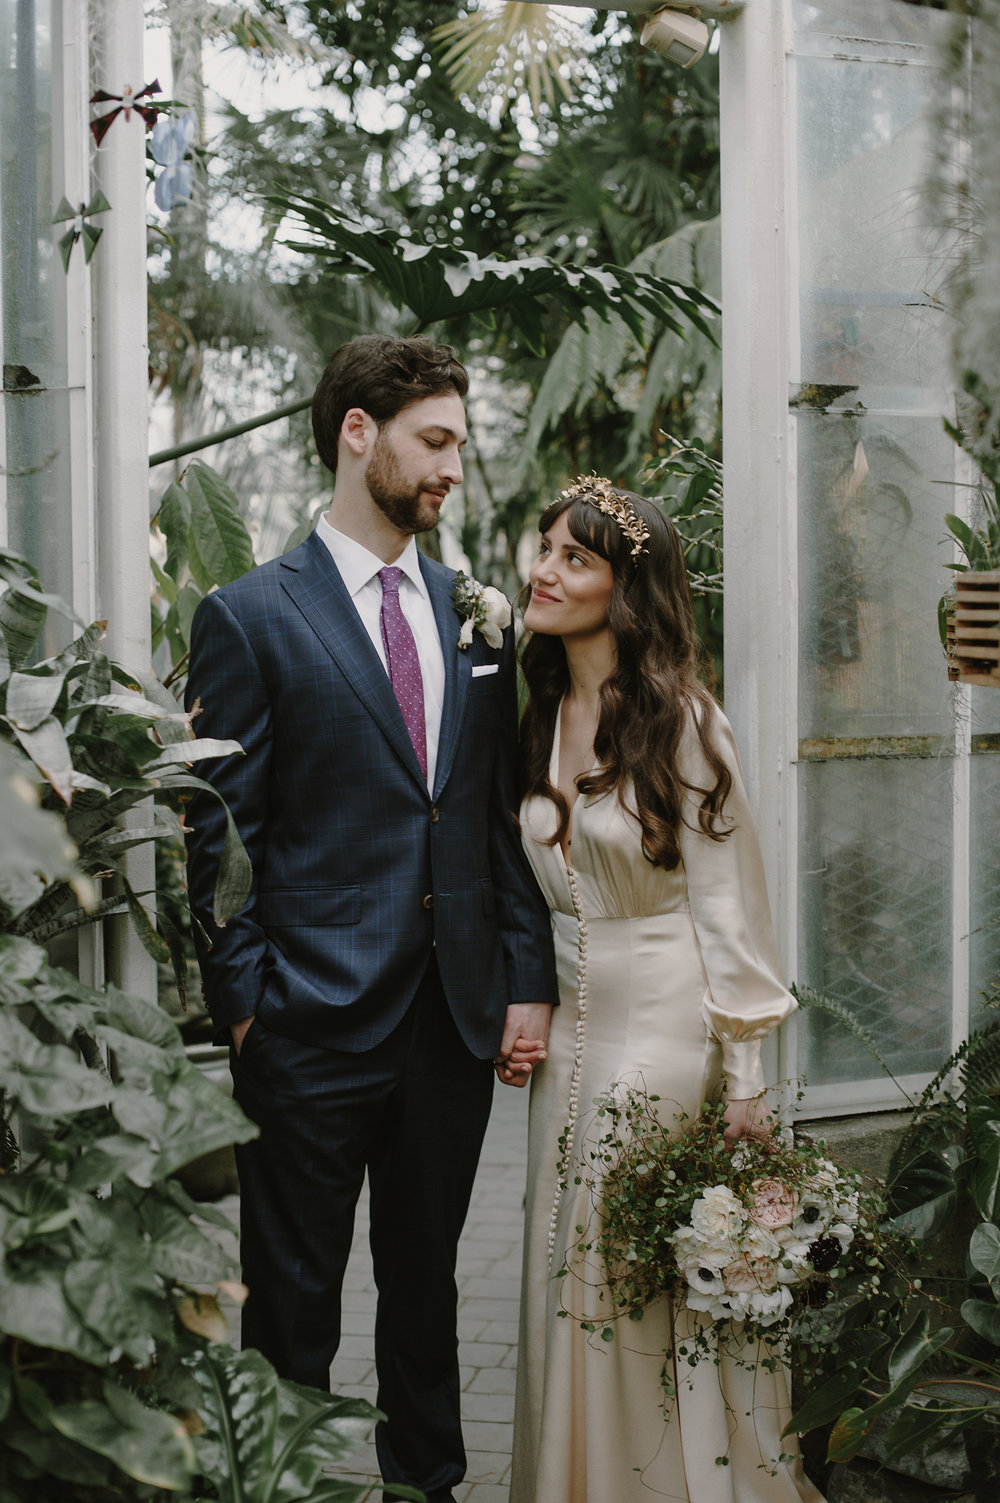 kristenmarieparker_tacoma_conservatory_warehouse_wedding063.JPG